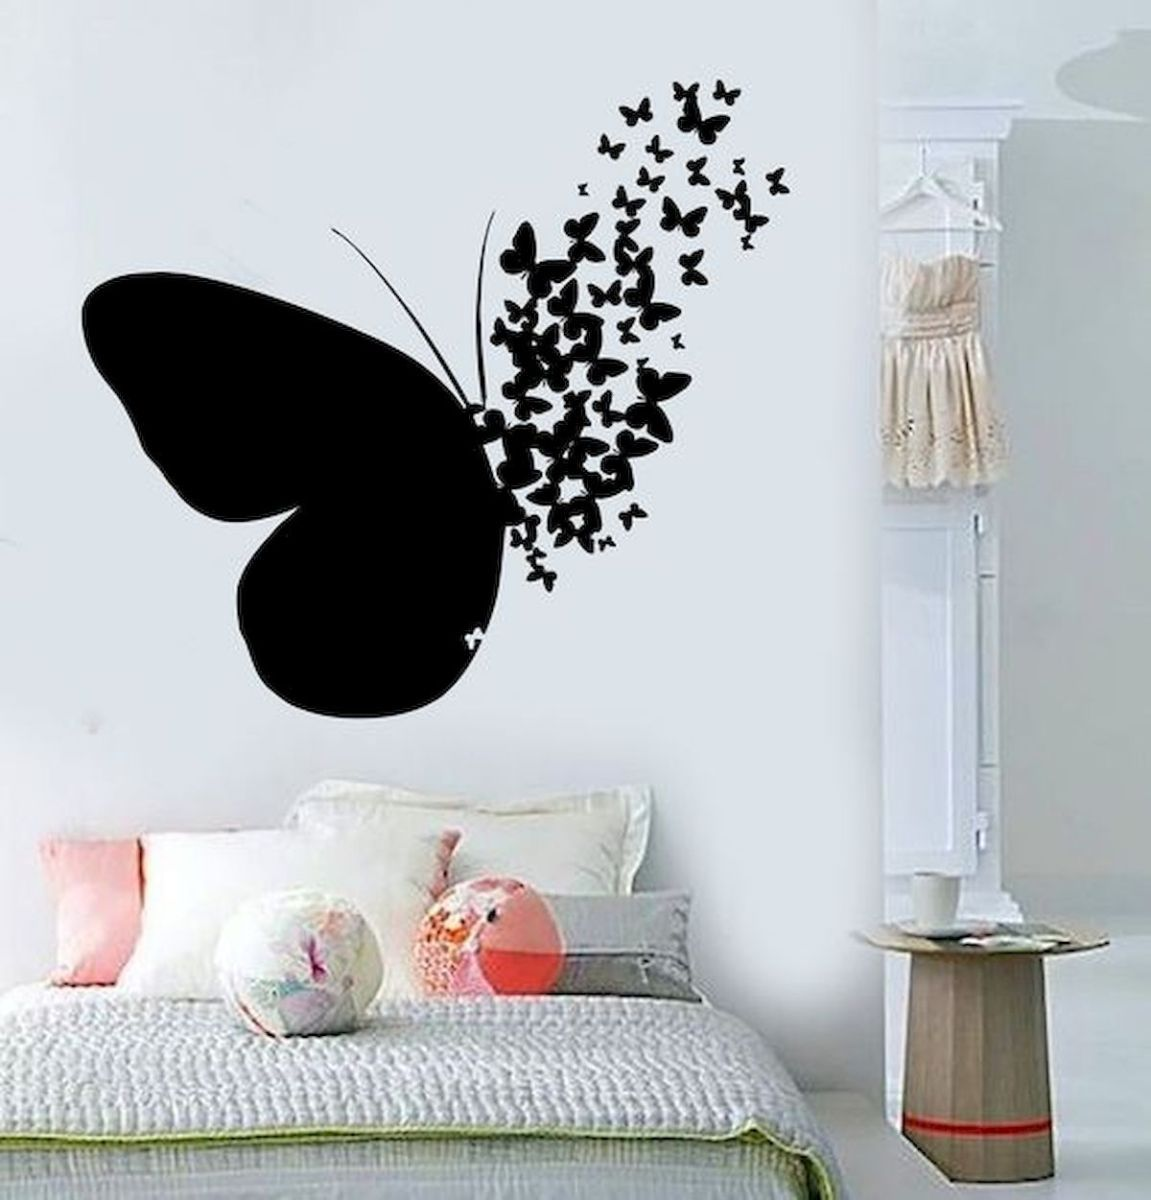 2019 Best Wall Art Ideas So Artsy 24 Worldecor Co Wall Stickers Bedroom Diy Wall Decor Wall Painting Decor